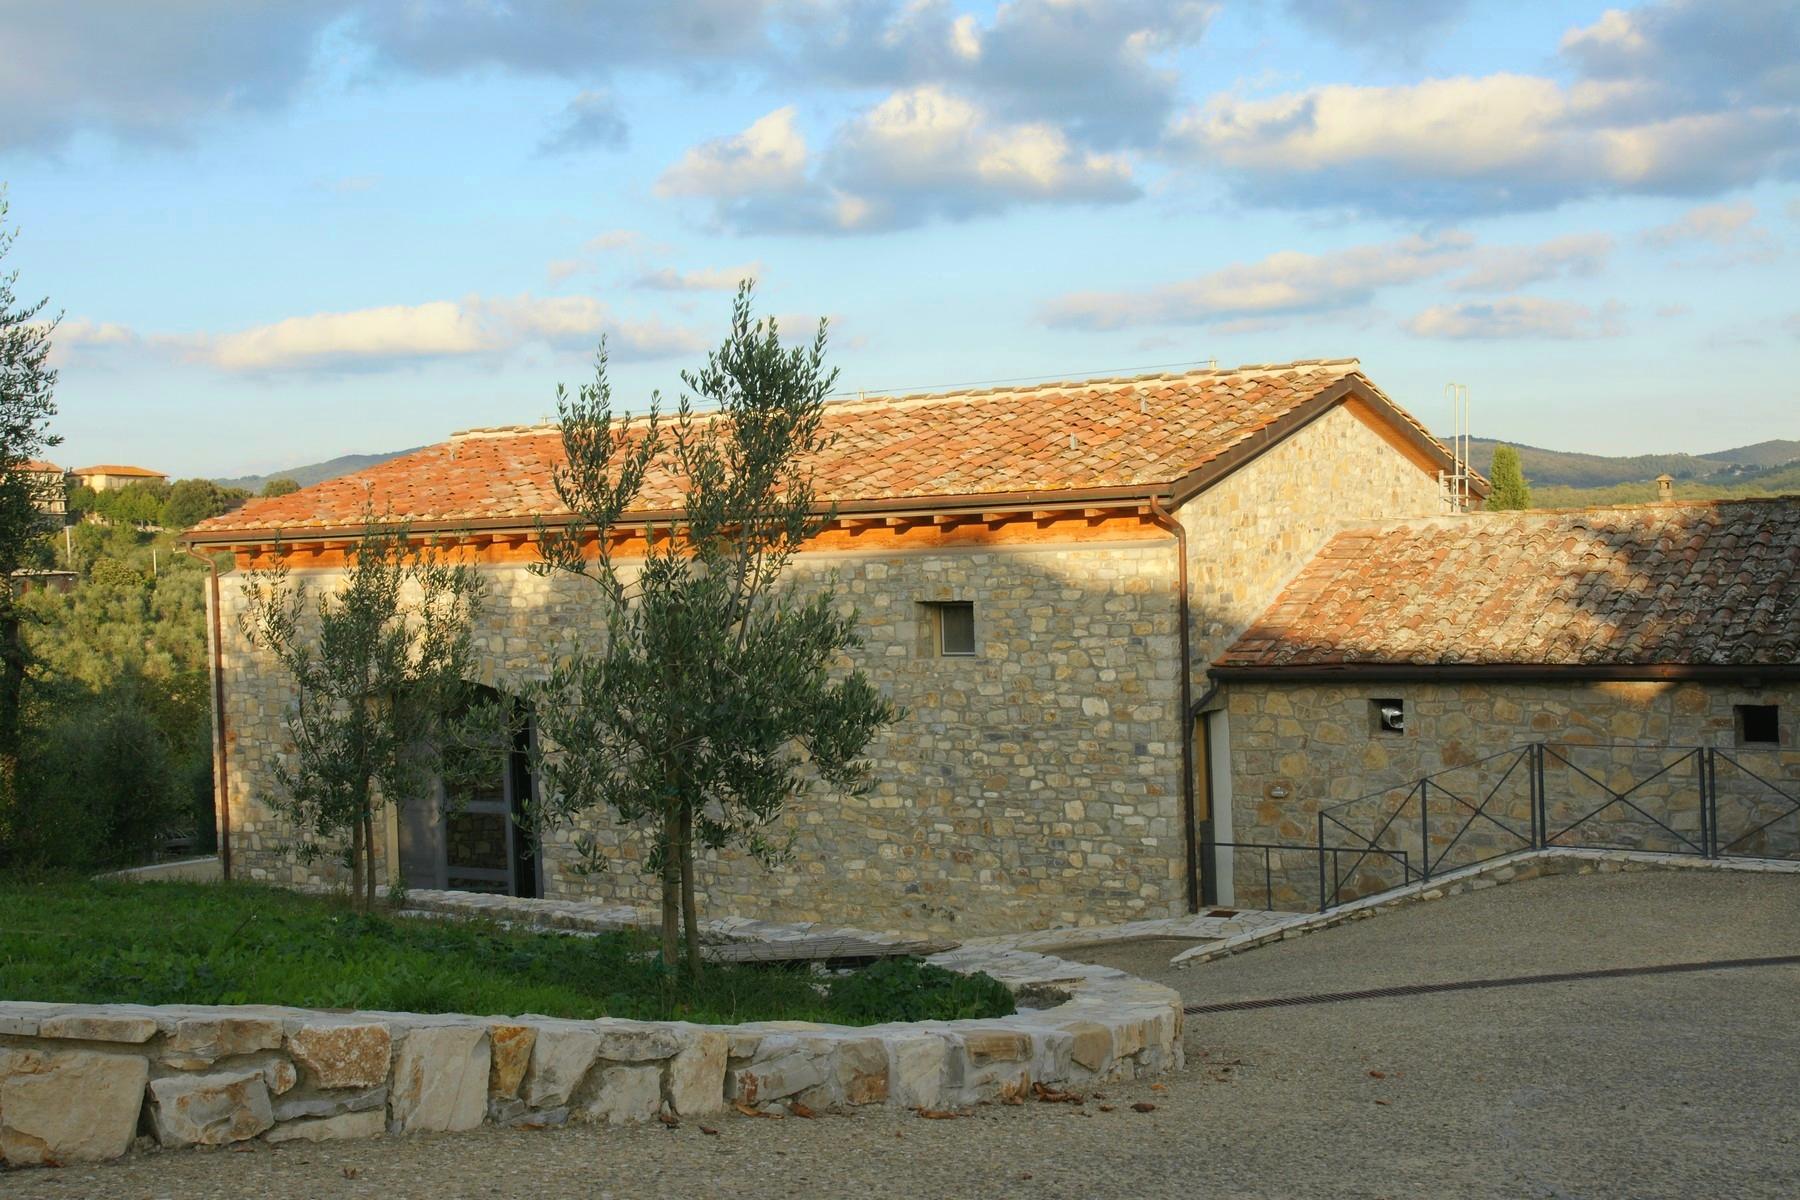 Rustico in Vendita a Radda In Chianti: 5 locali, 1380 mq - Foto 6